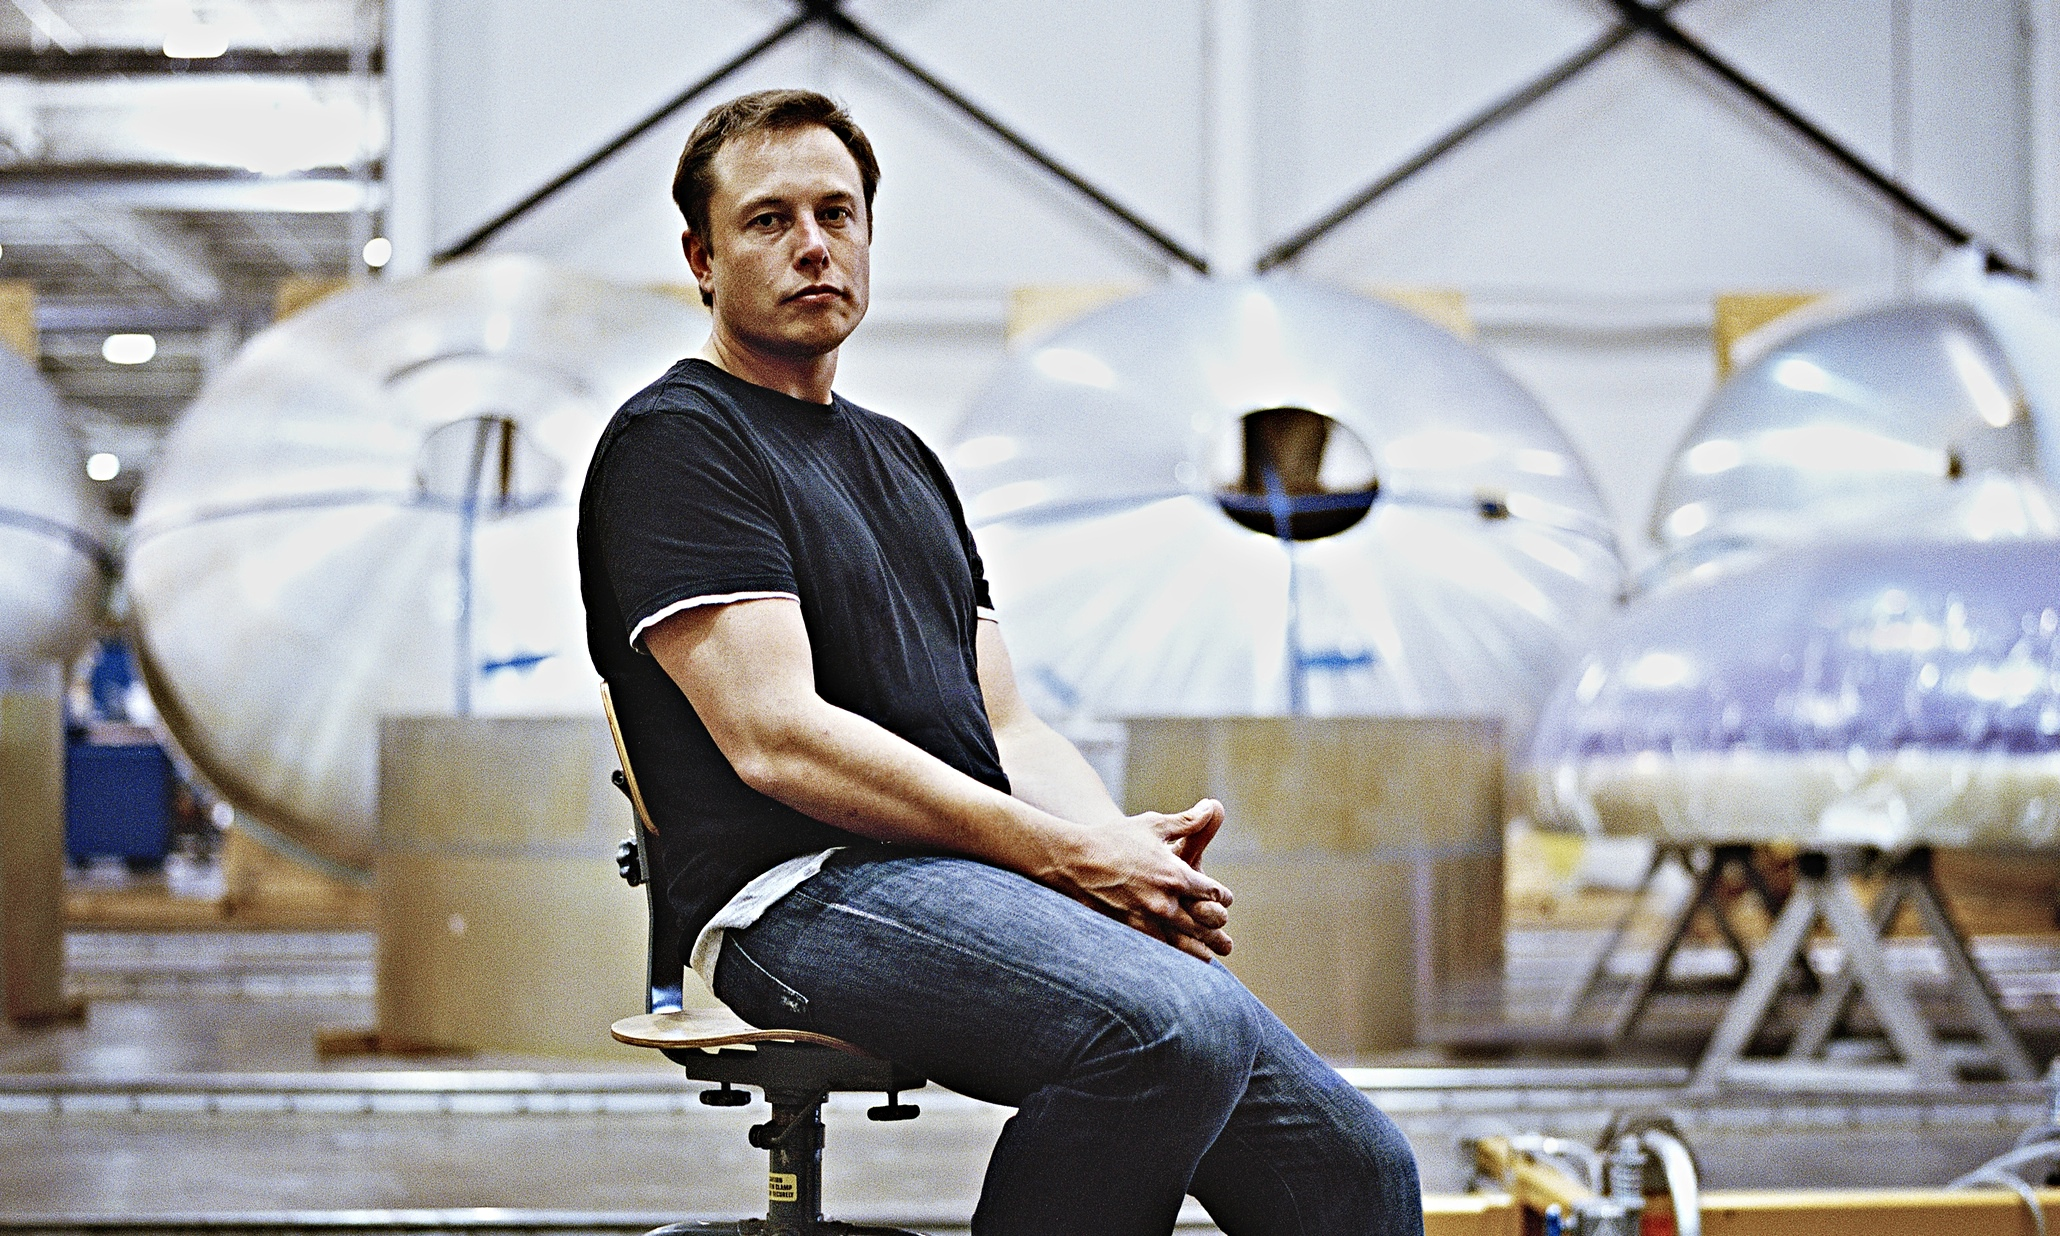 Elon Musk introducción